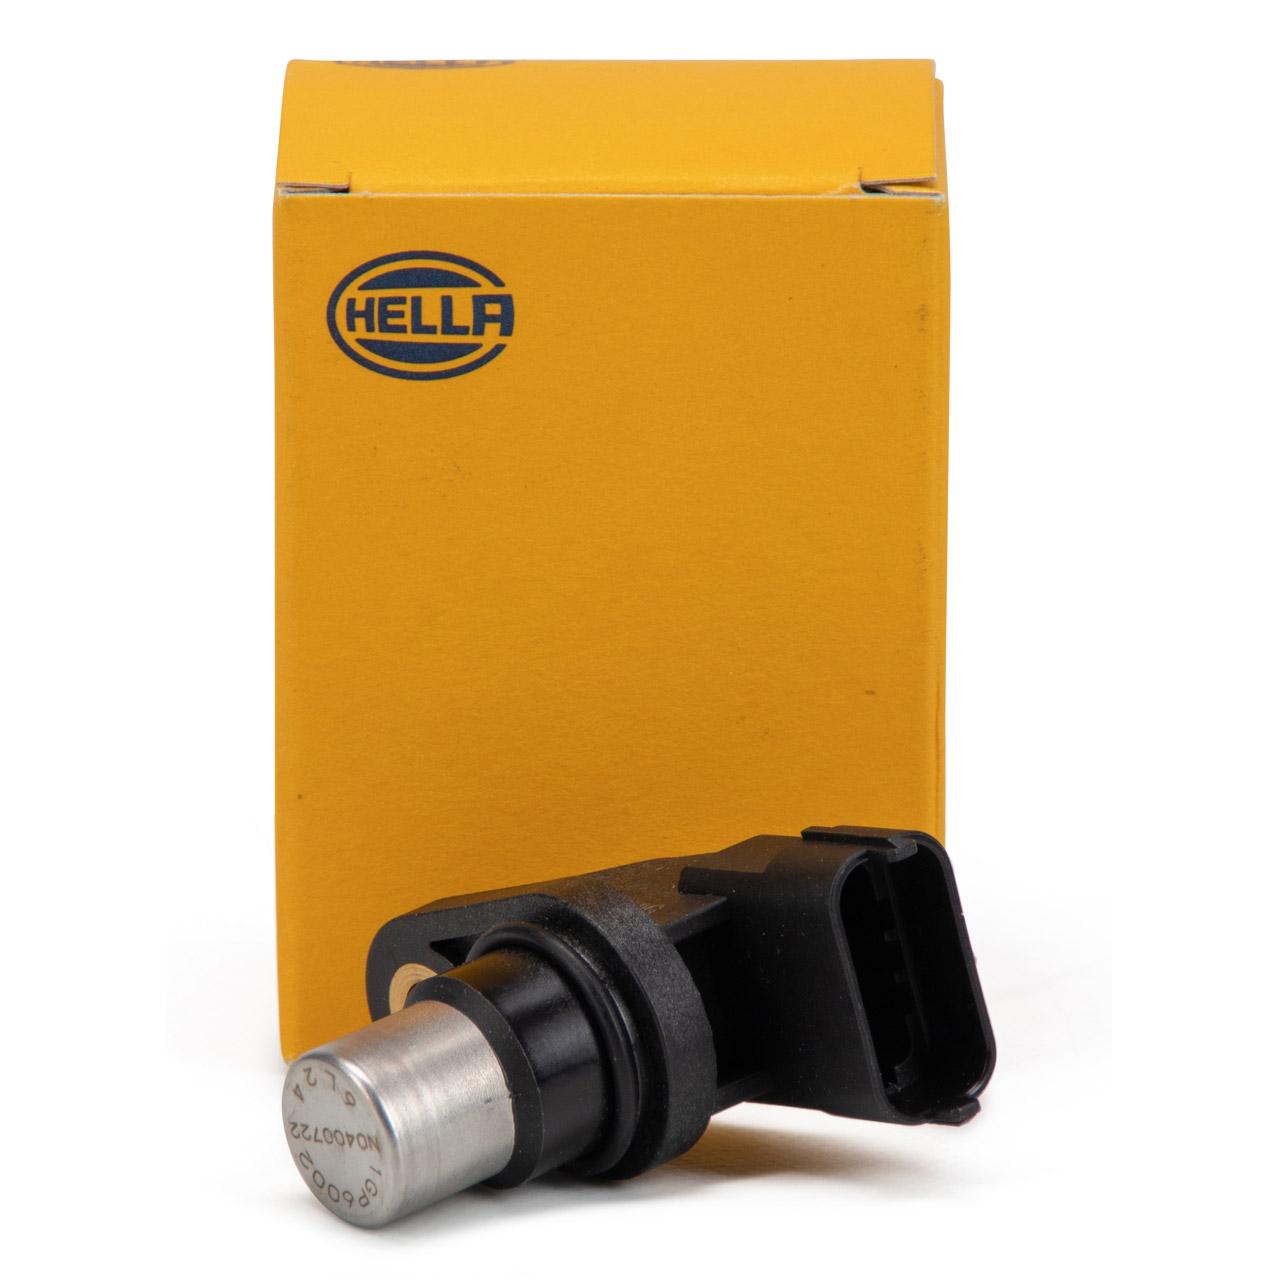 HELLA Sensor Nockenwelle Nockenwellensensor für OPEL ASTRA H G FORD HONDA VOLVO